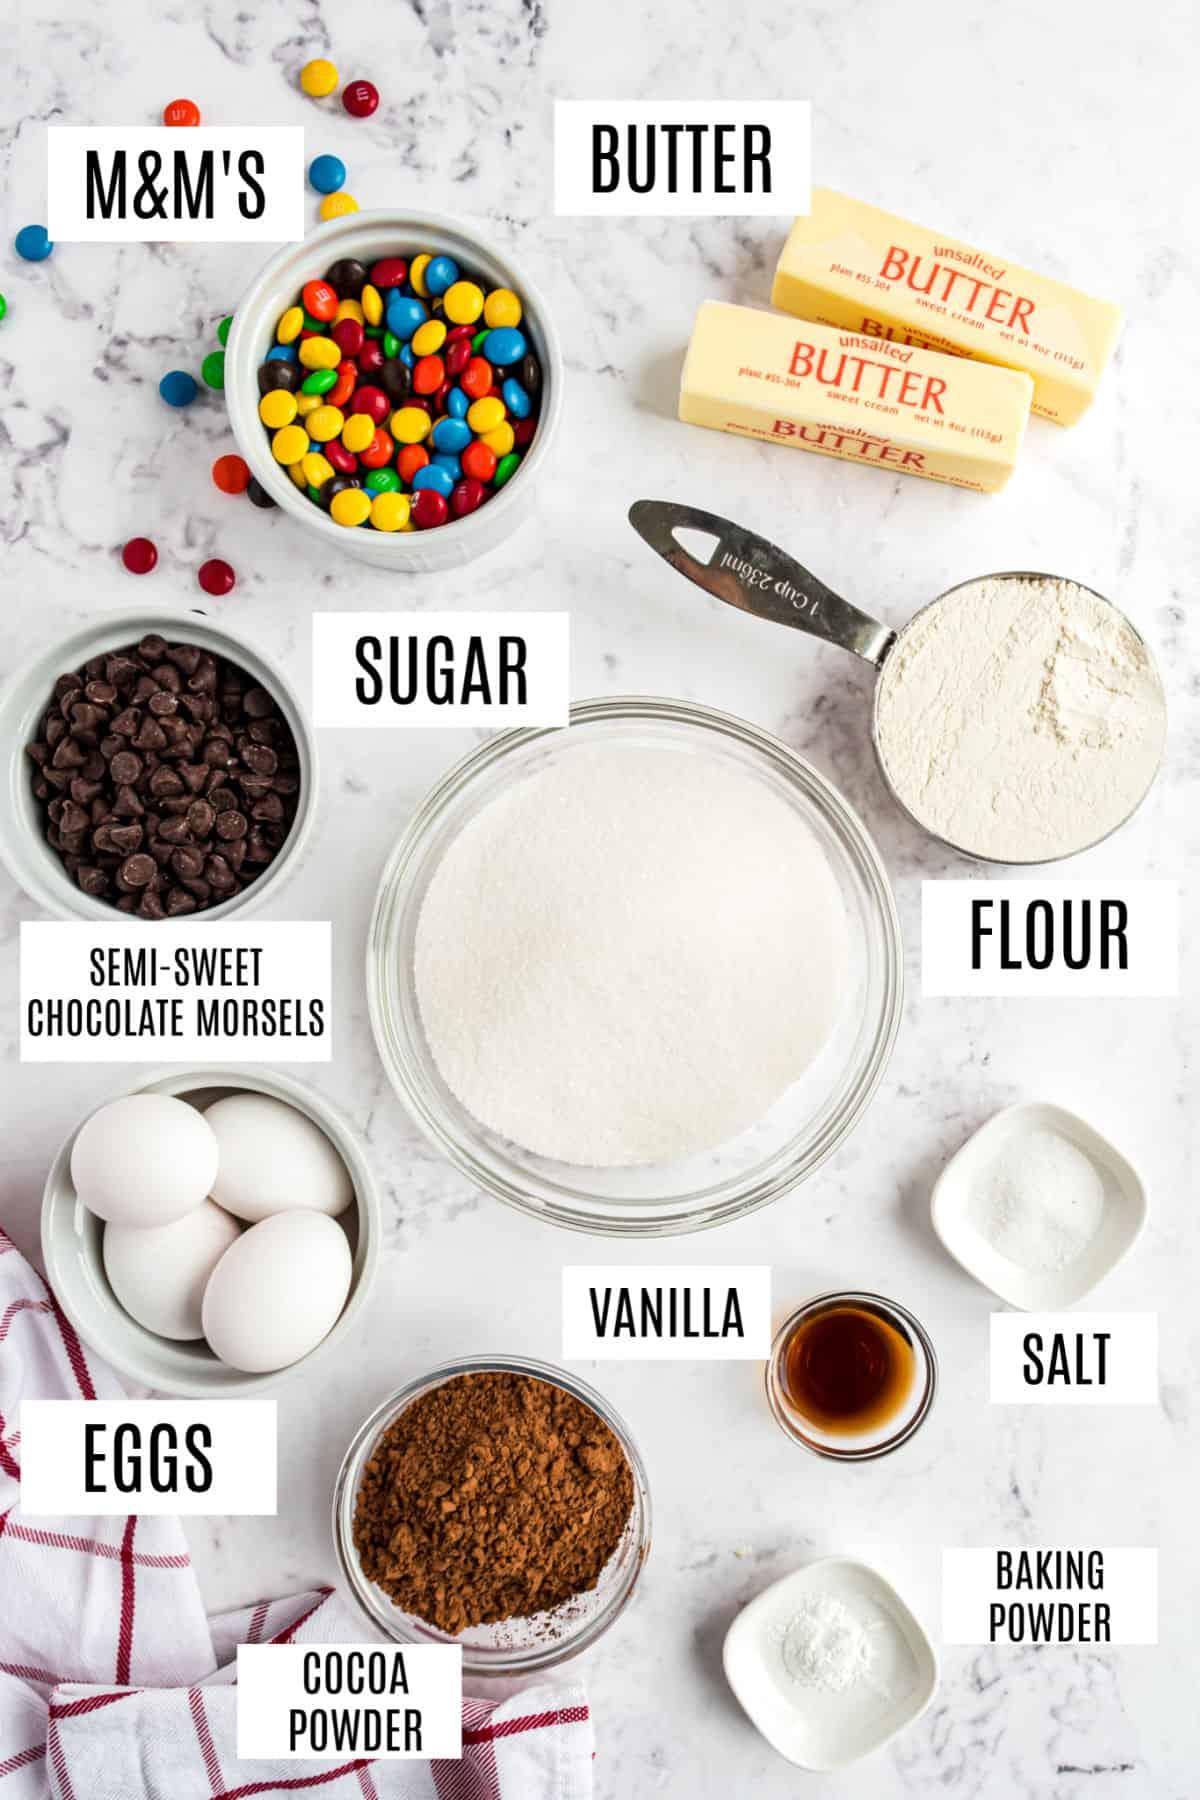 Ingredients needed for M&M's brownies.